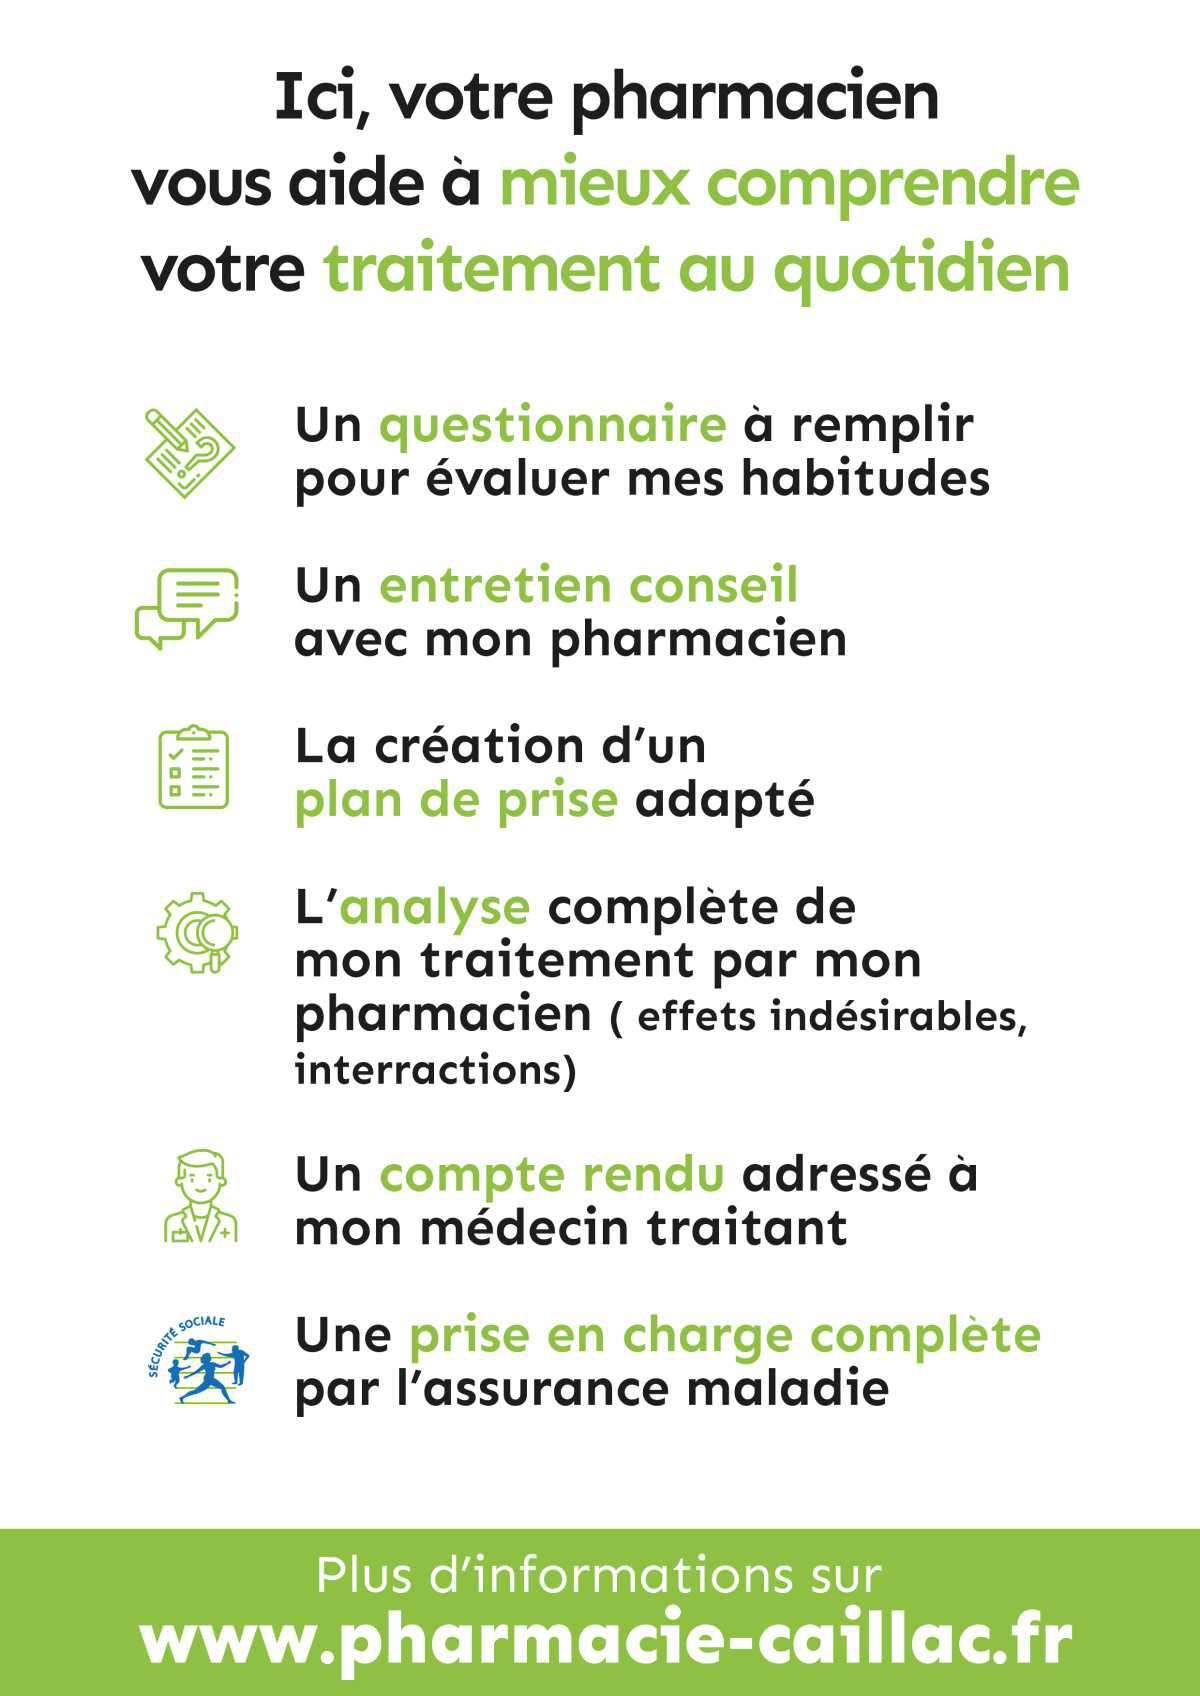 Le bilan de médication: un grand OUI !